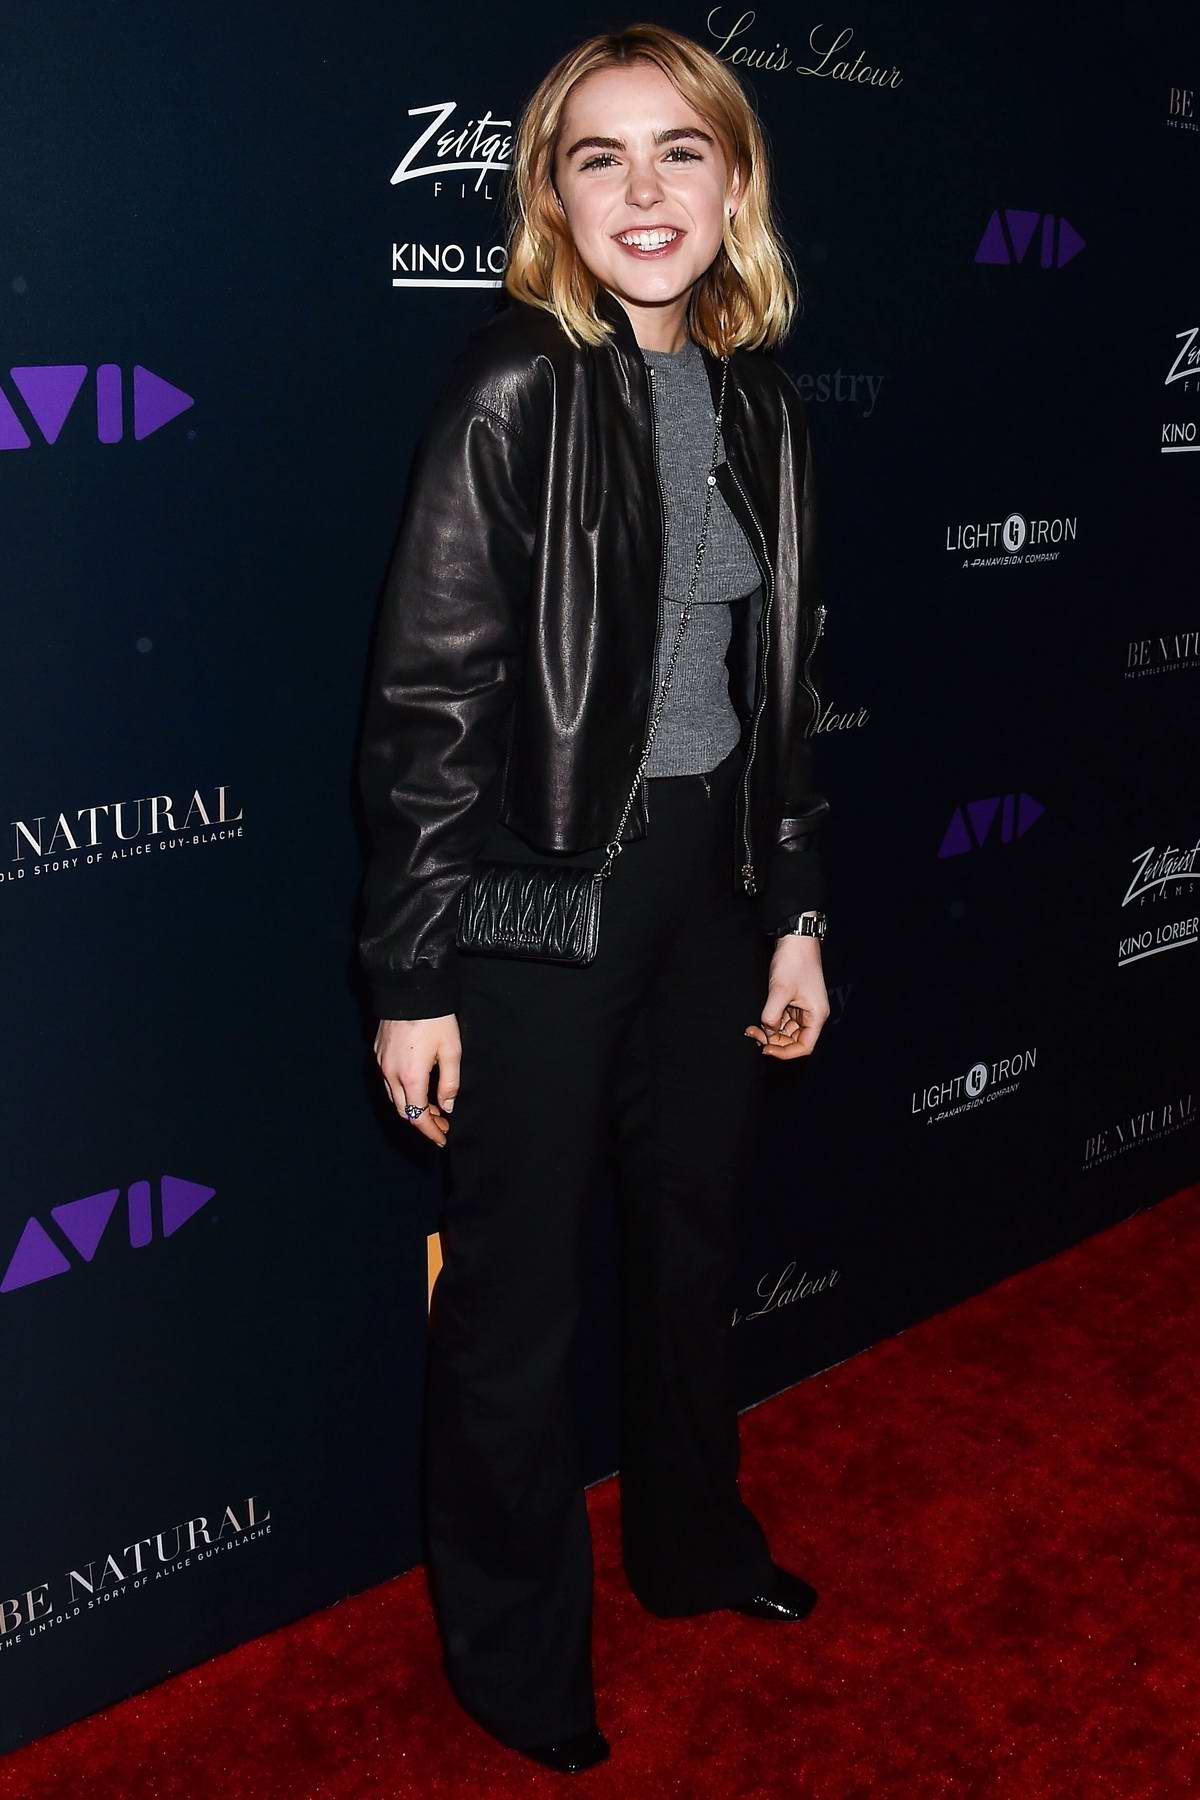 Kiernan Shipka attends 'Be Natural: The Untold Story of Alice Guy-Blache' Film Premiere in Los Angeles